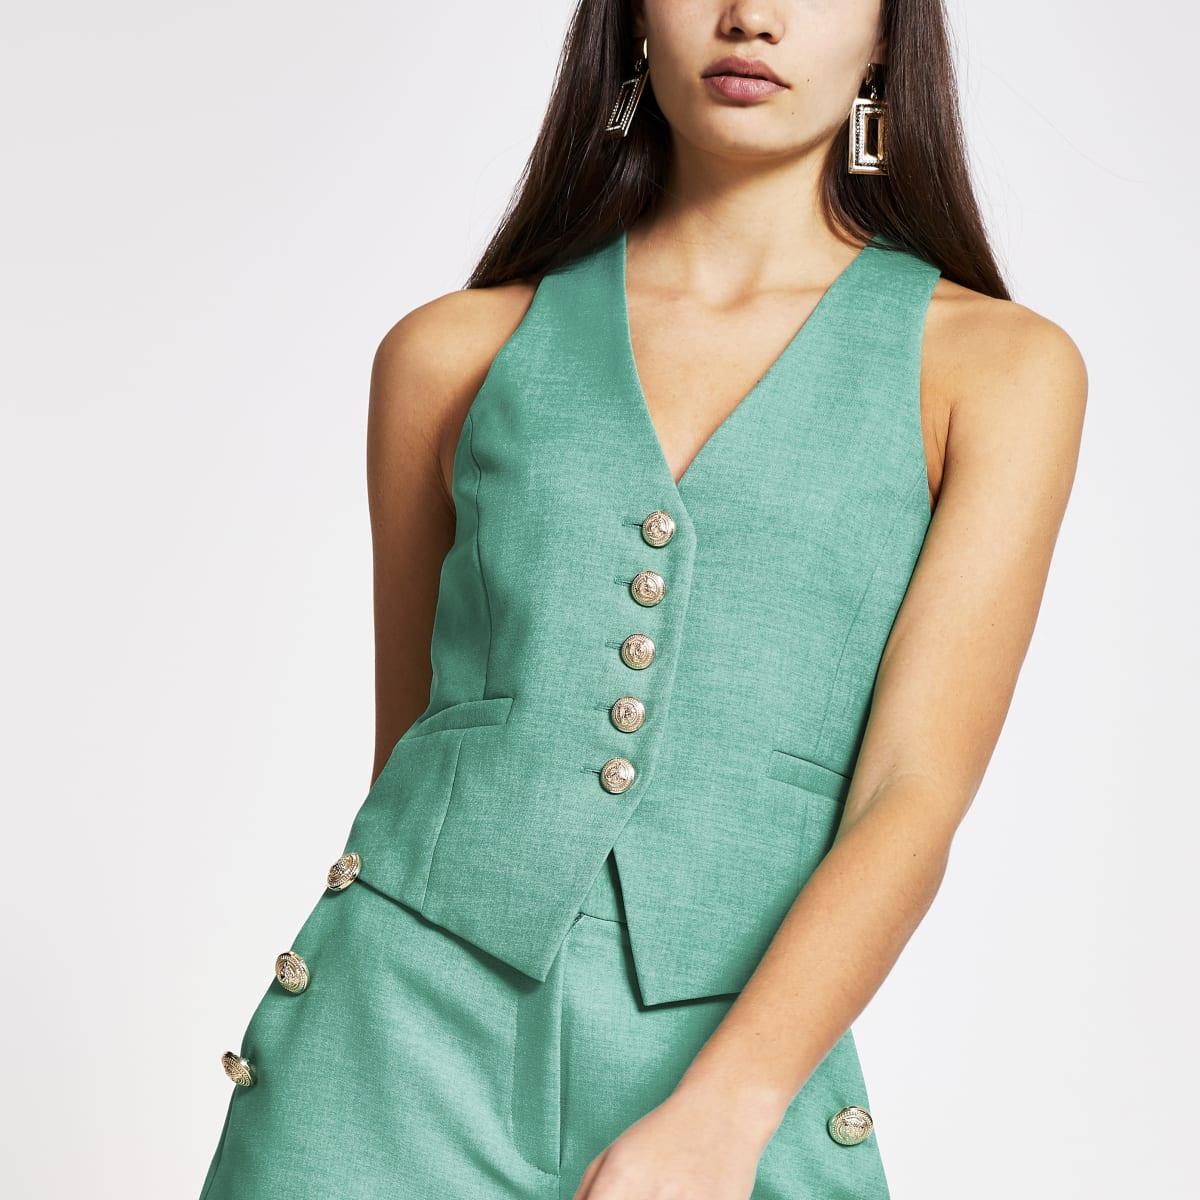 Green button front waistcoat